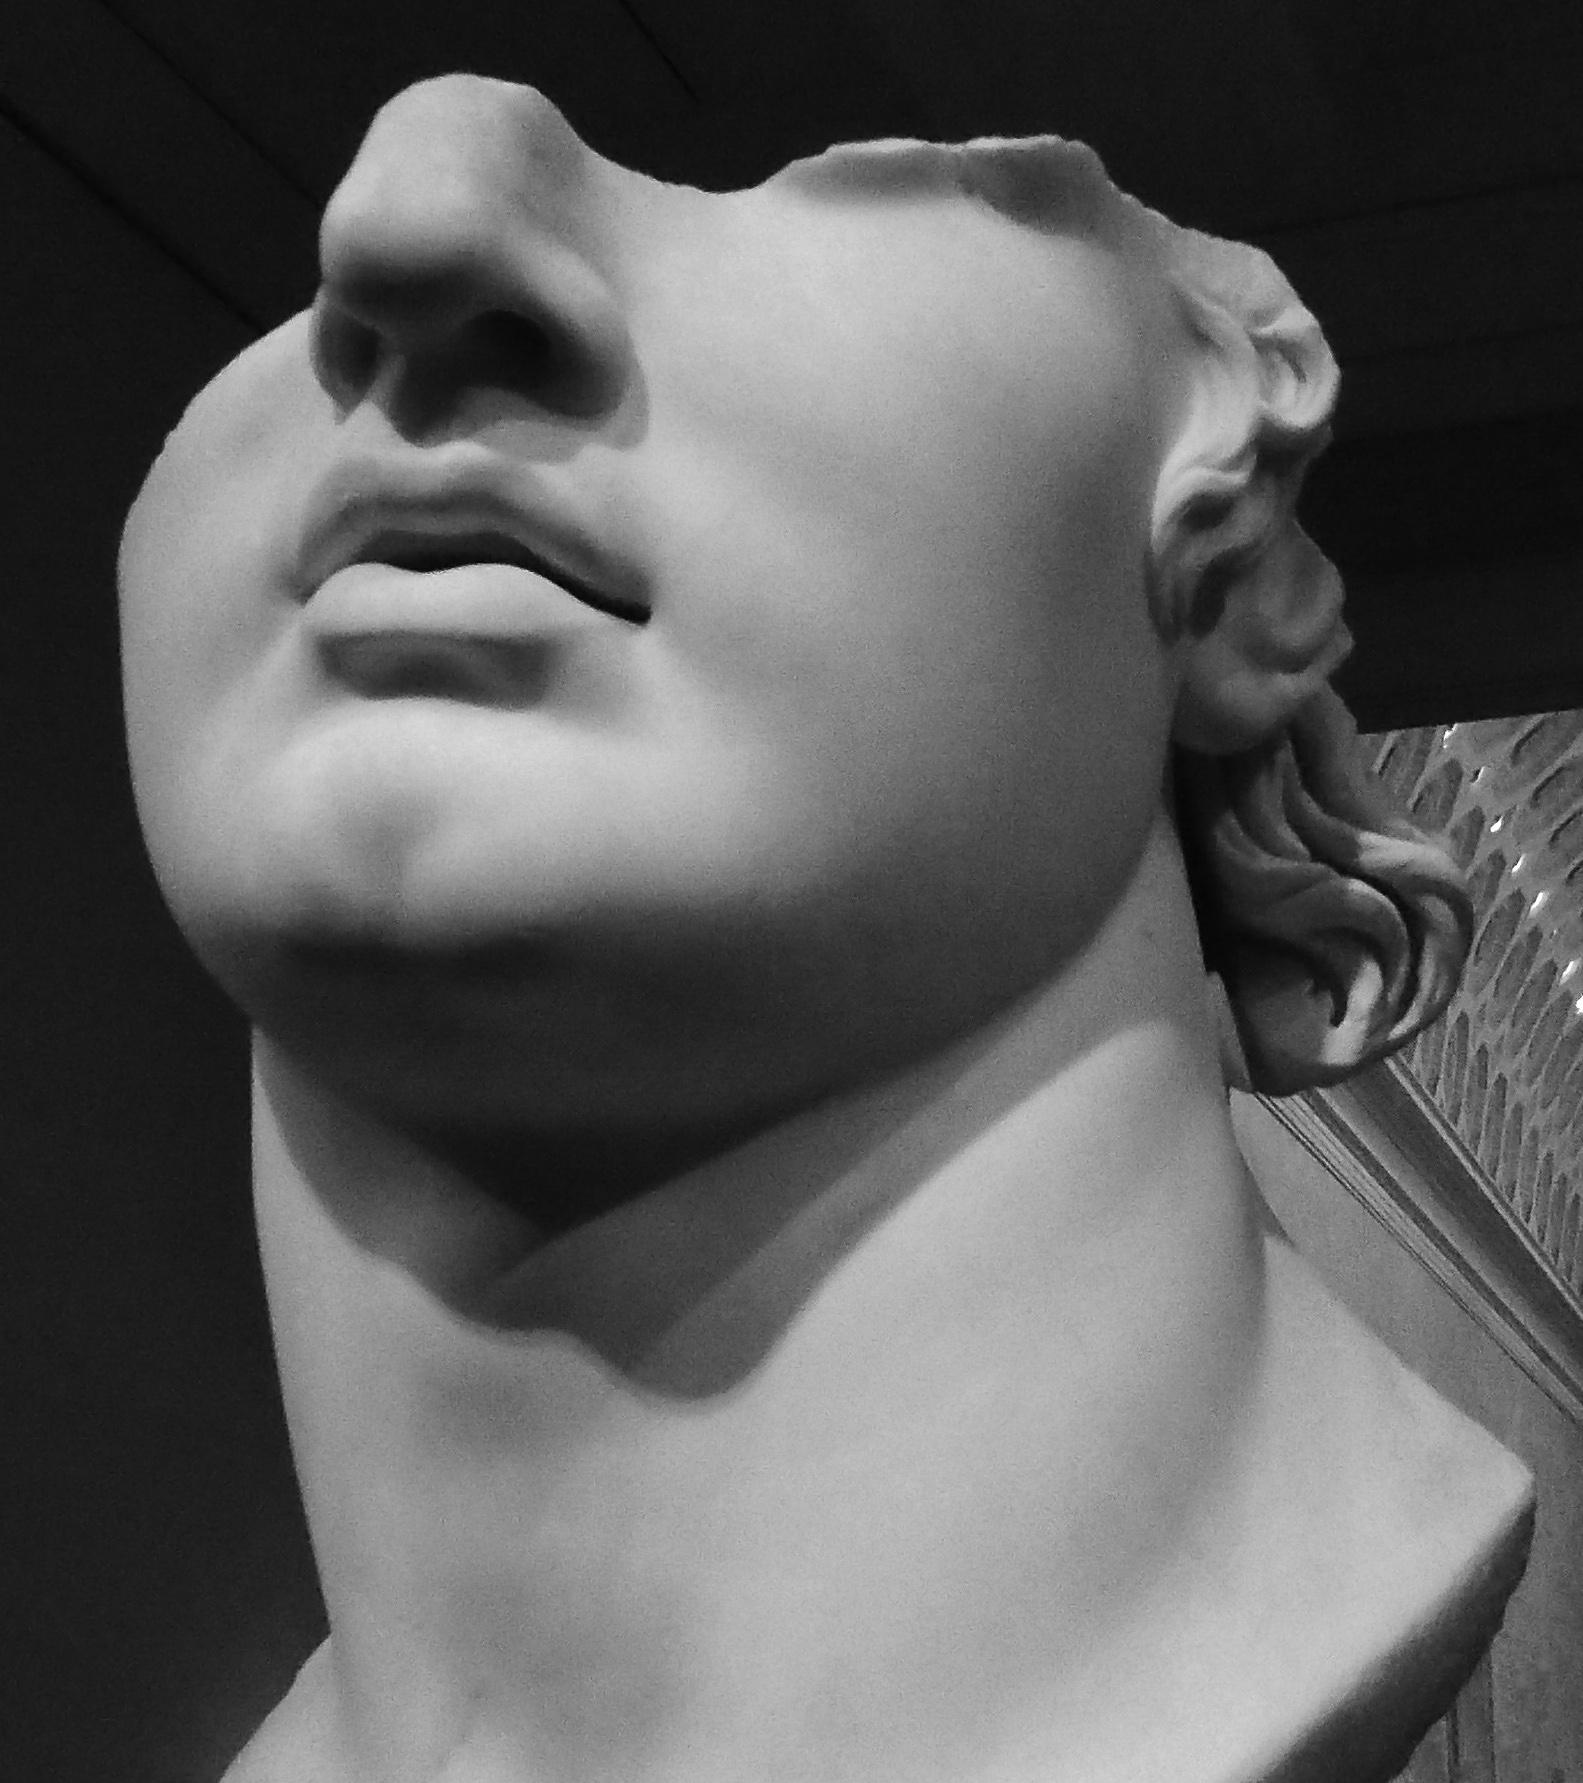 broken face statue blwh